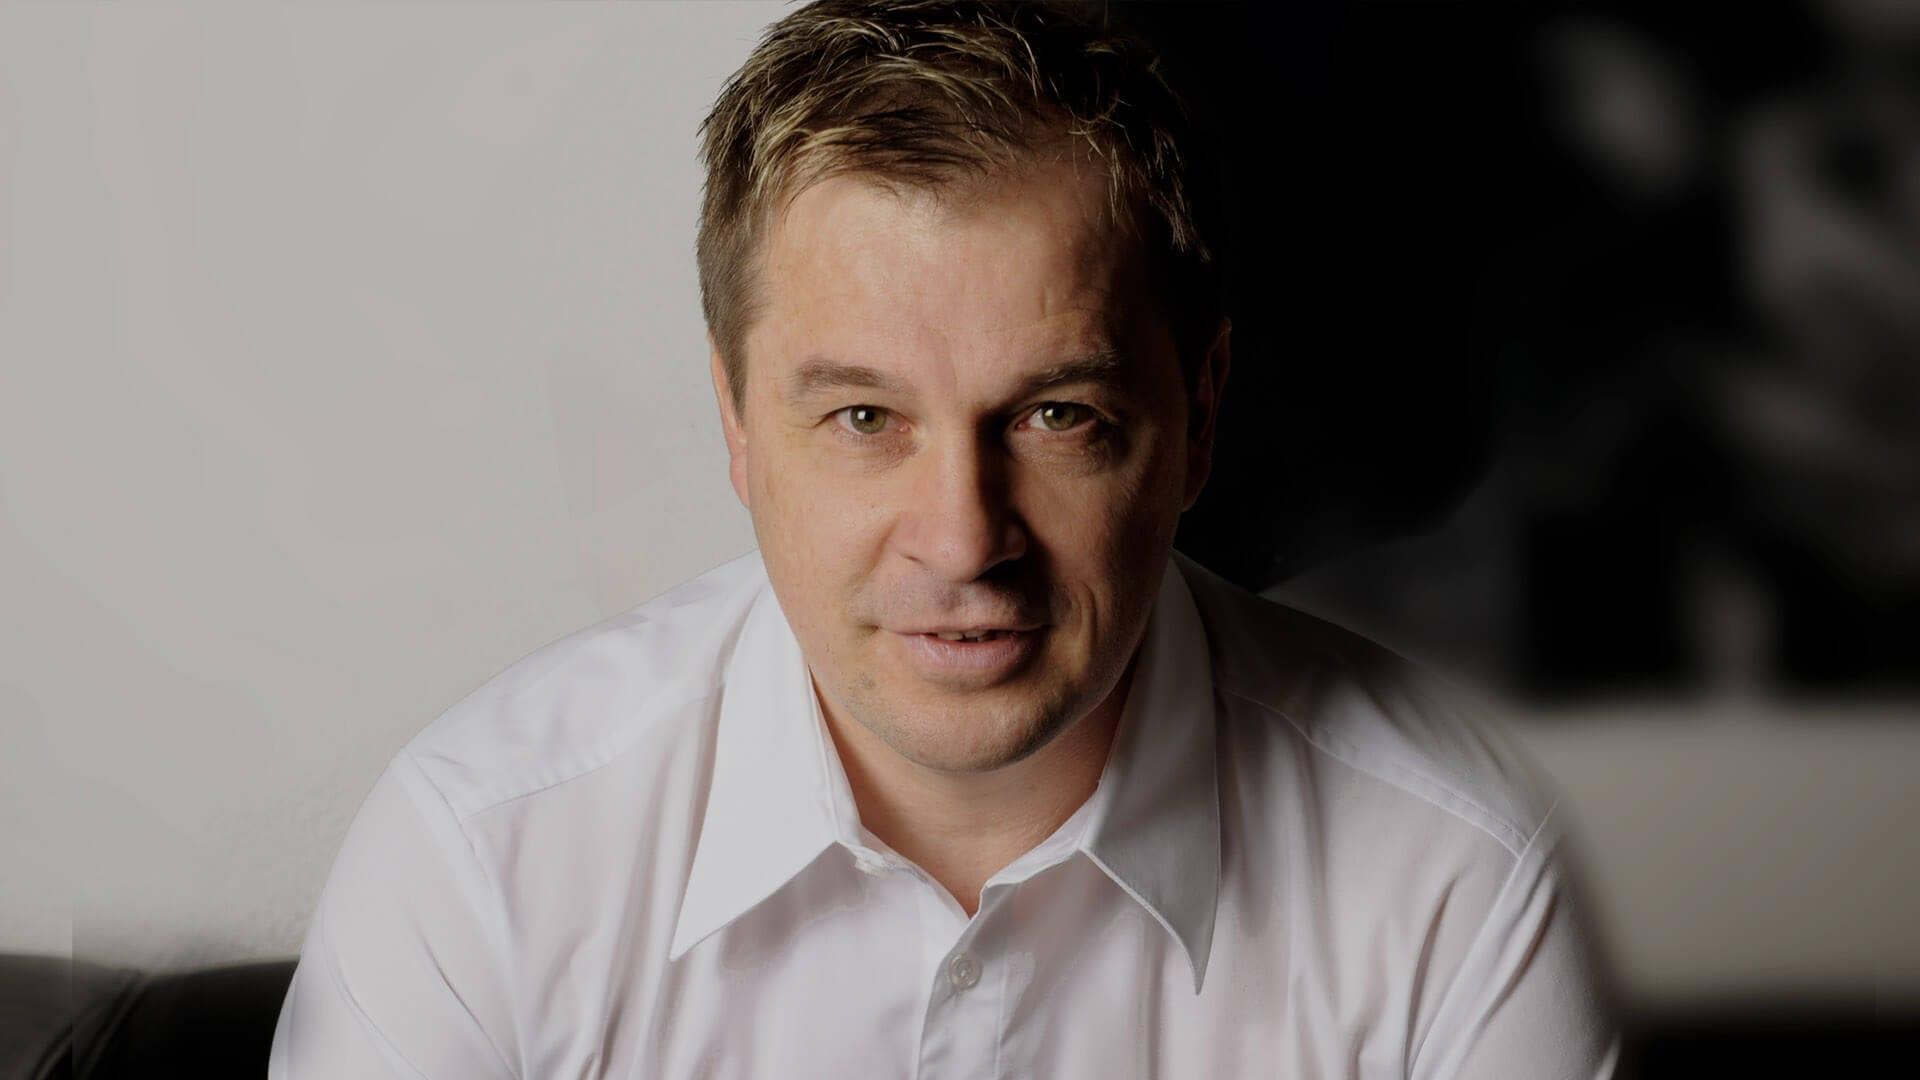 Dr. med. Michael Rechberger